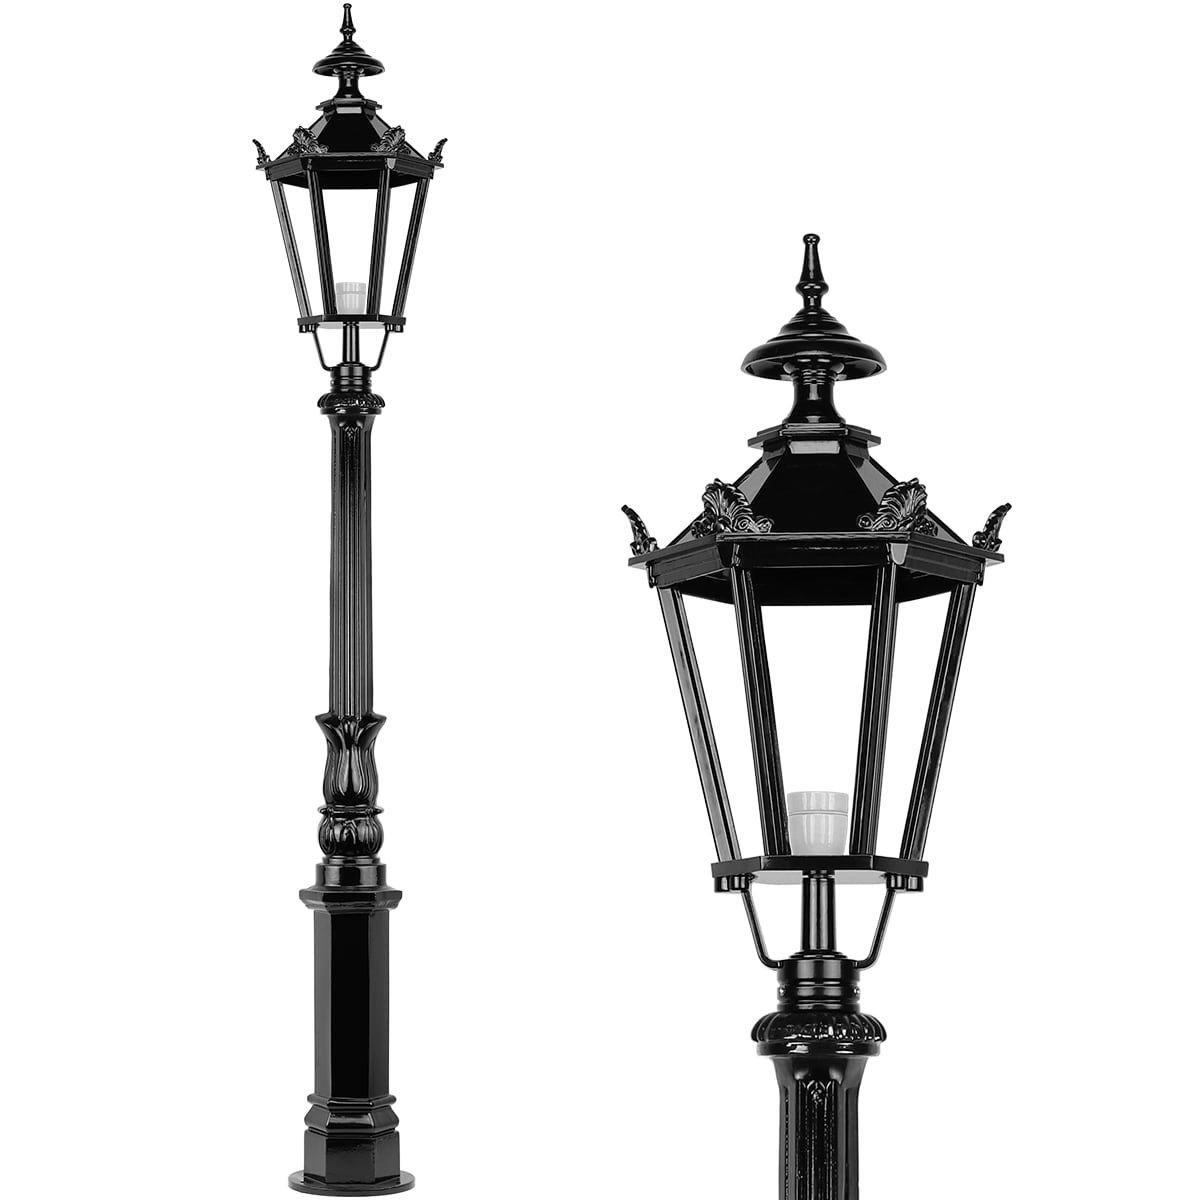 Outdoor Lighting Classic Rural Lantern pole pastorie style Harderwijk - 198 cm